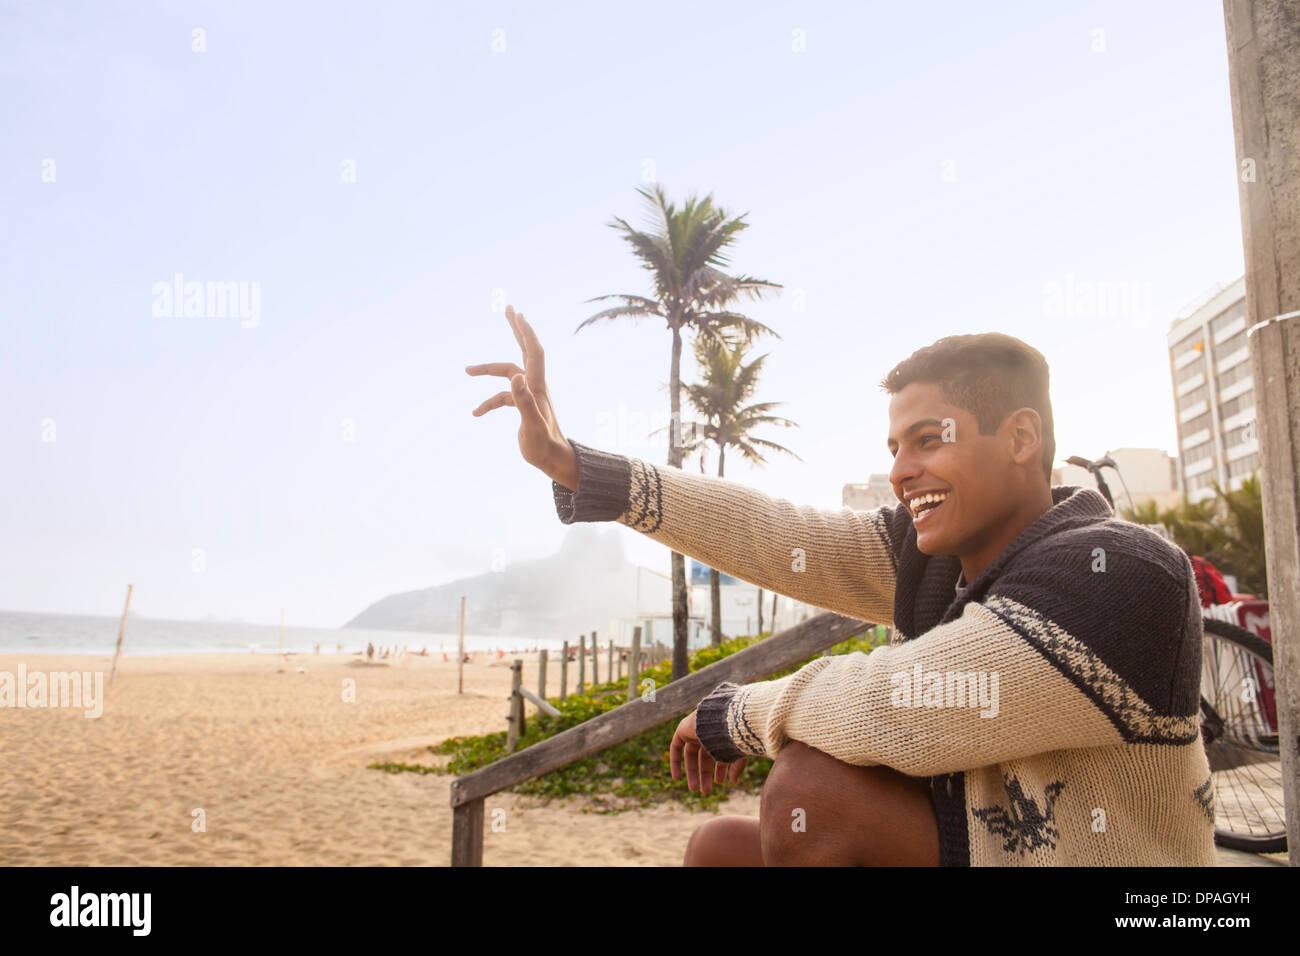 Young man waving, Ipanema Beach, Rio de Janeiro, Brazil - Stock Image